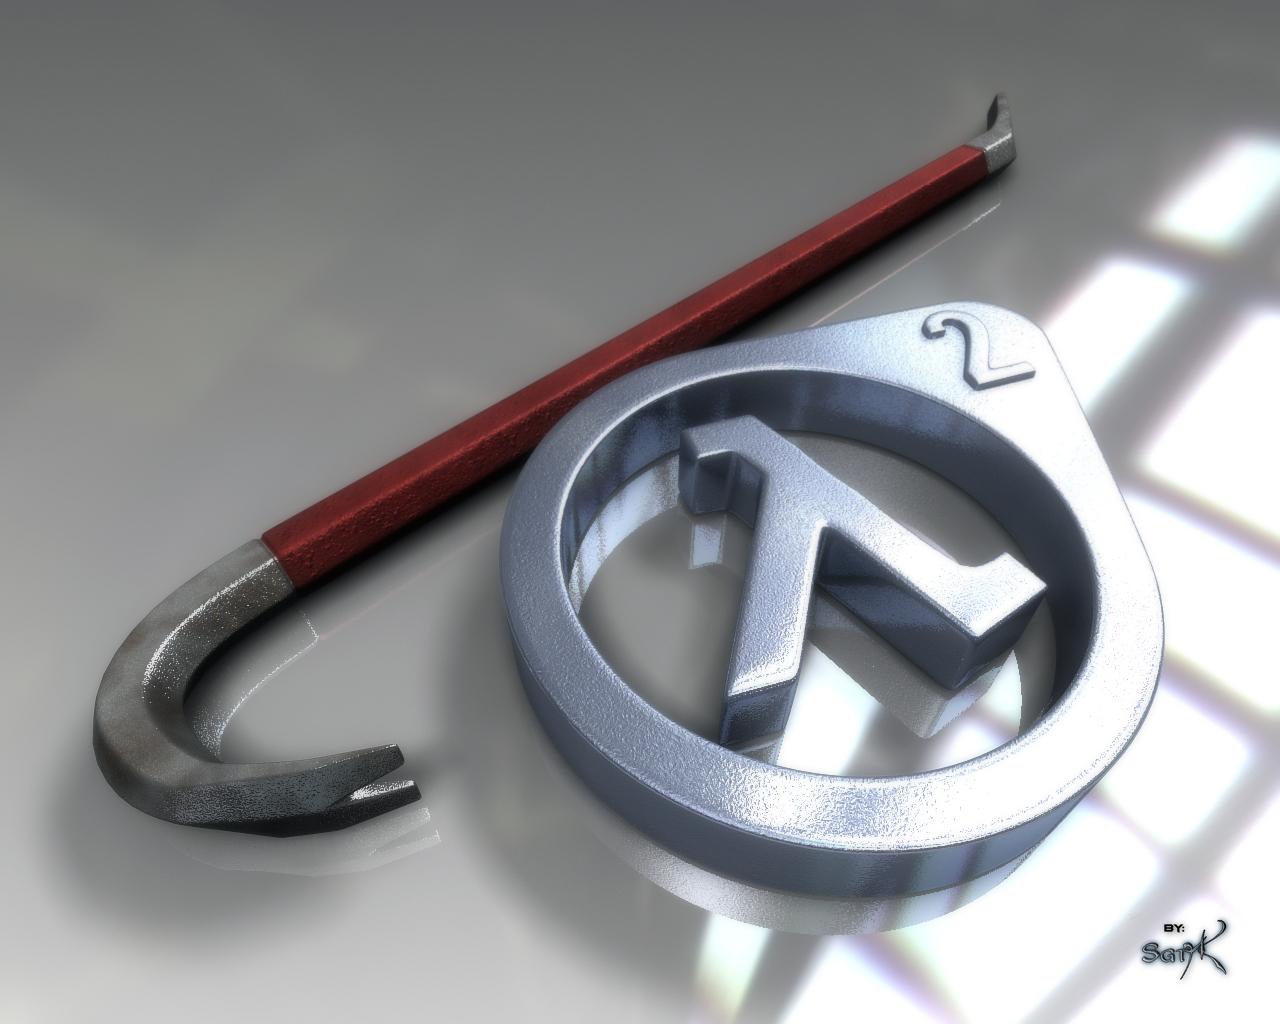 Half-Life 2 Crowbar and Lambda by SgtHK